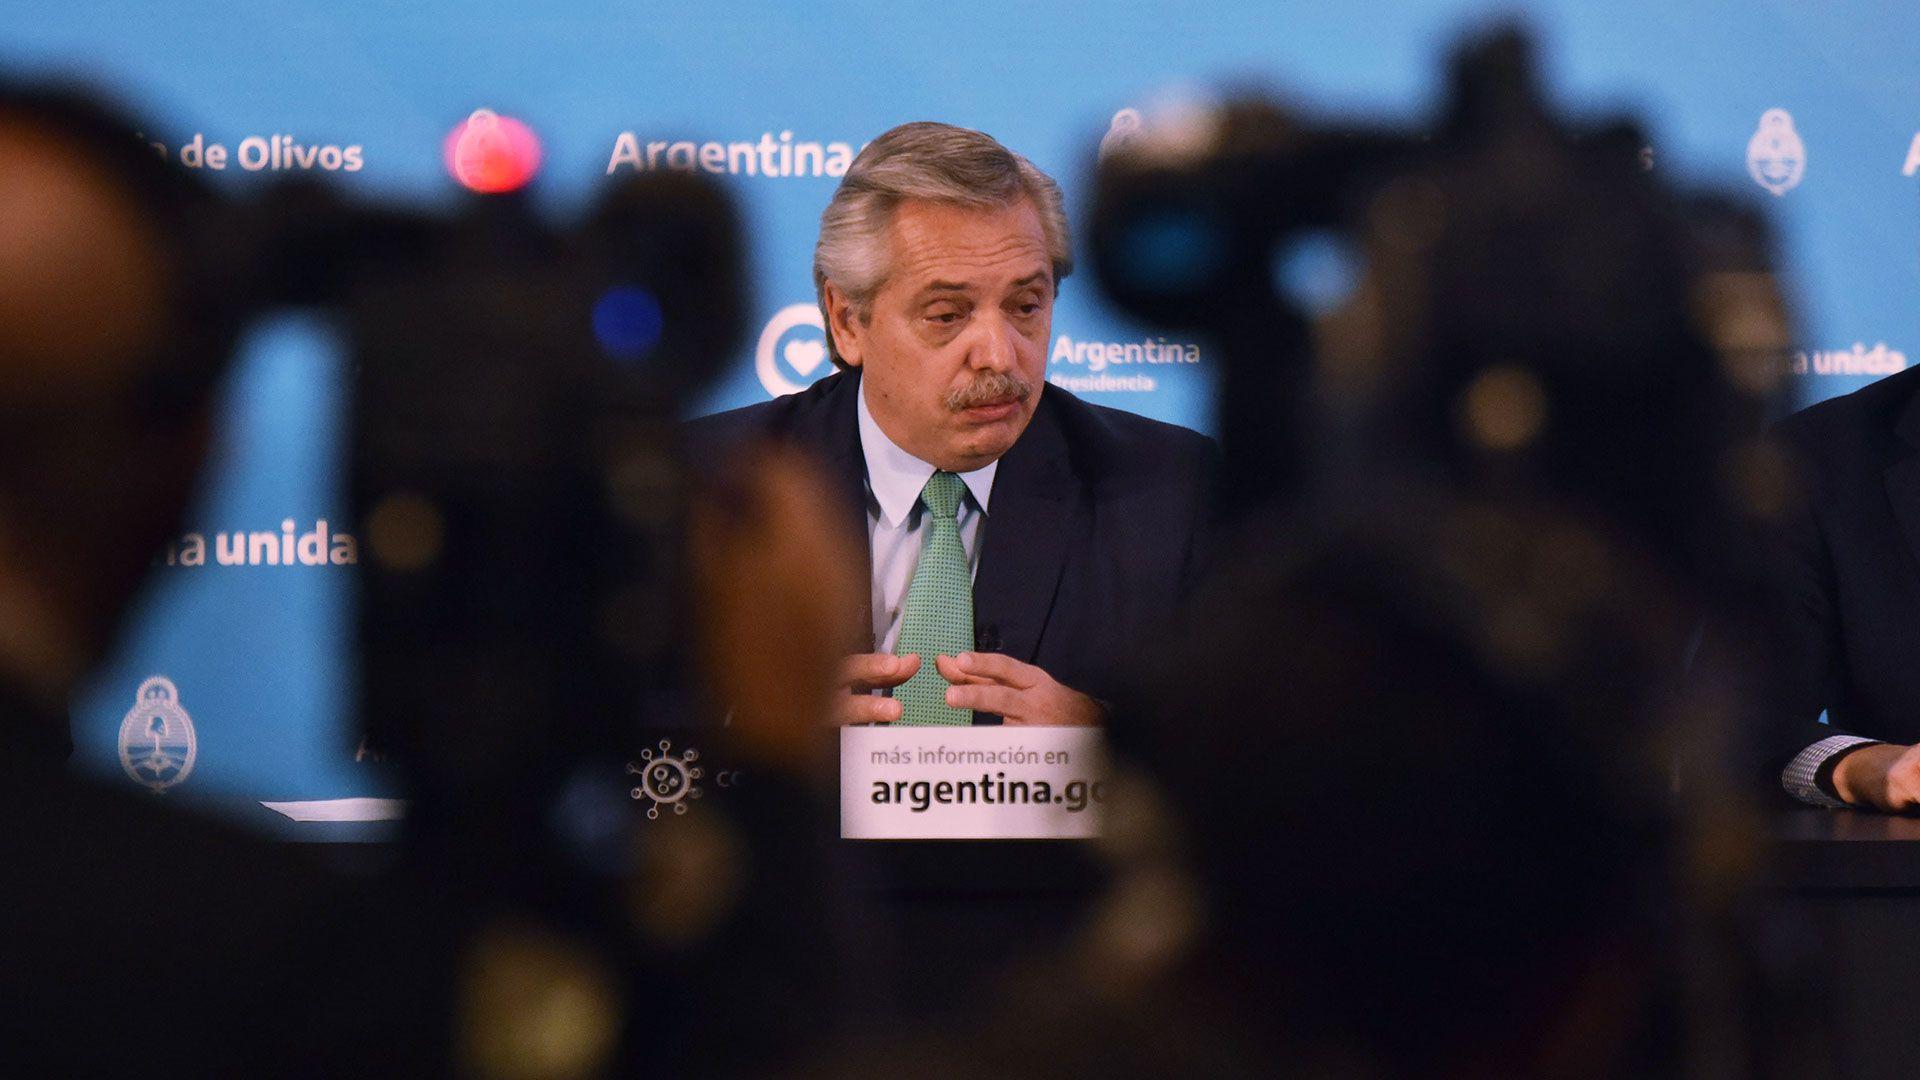 Conferencia de prensa Alberto Fernandez coronavirus olivos COVID 19 10 abril